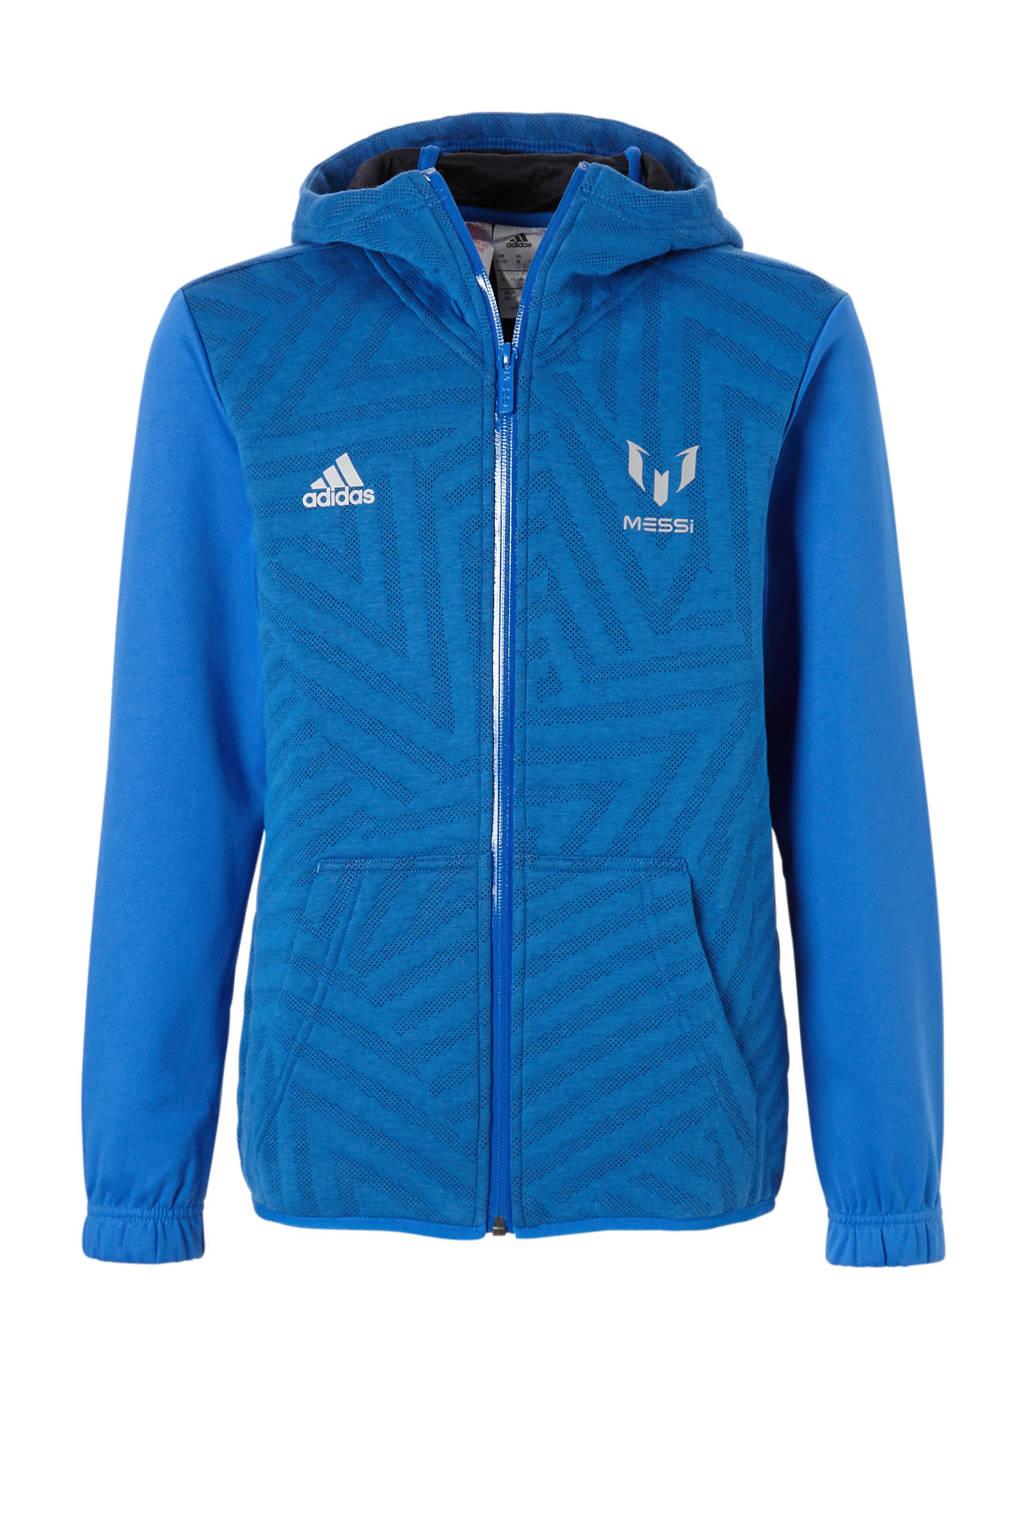 adidas performance   Messi sportvest blauw, Blauw